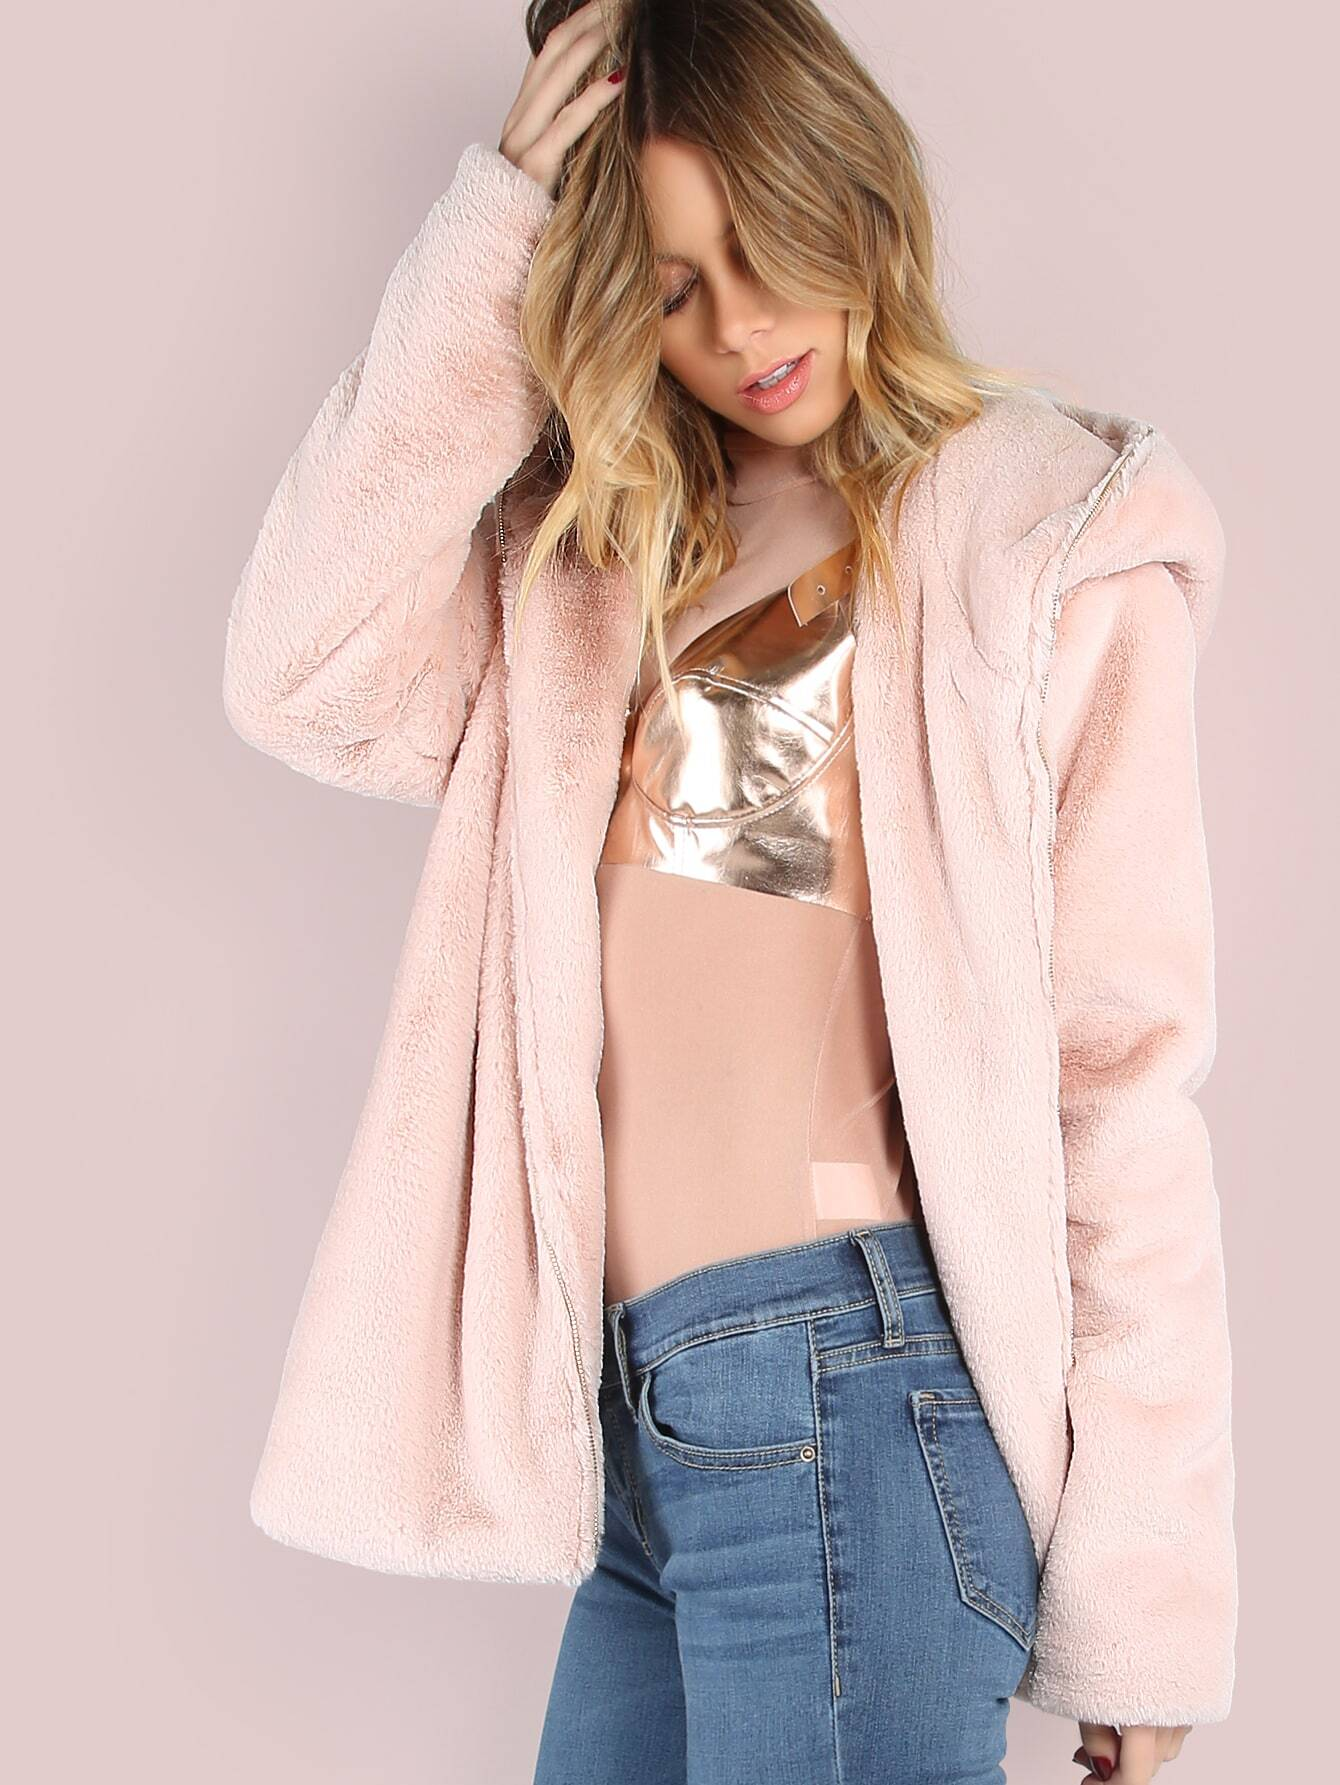 Coats Hot Pink Hooded Casual Zipper Short Winter Plain Fabric has no stretch Long Sleeve Outerwear.